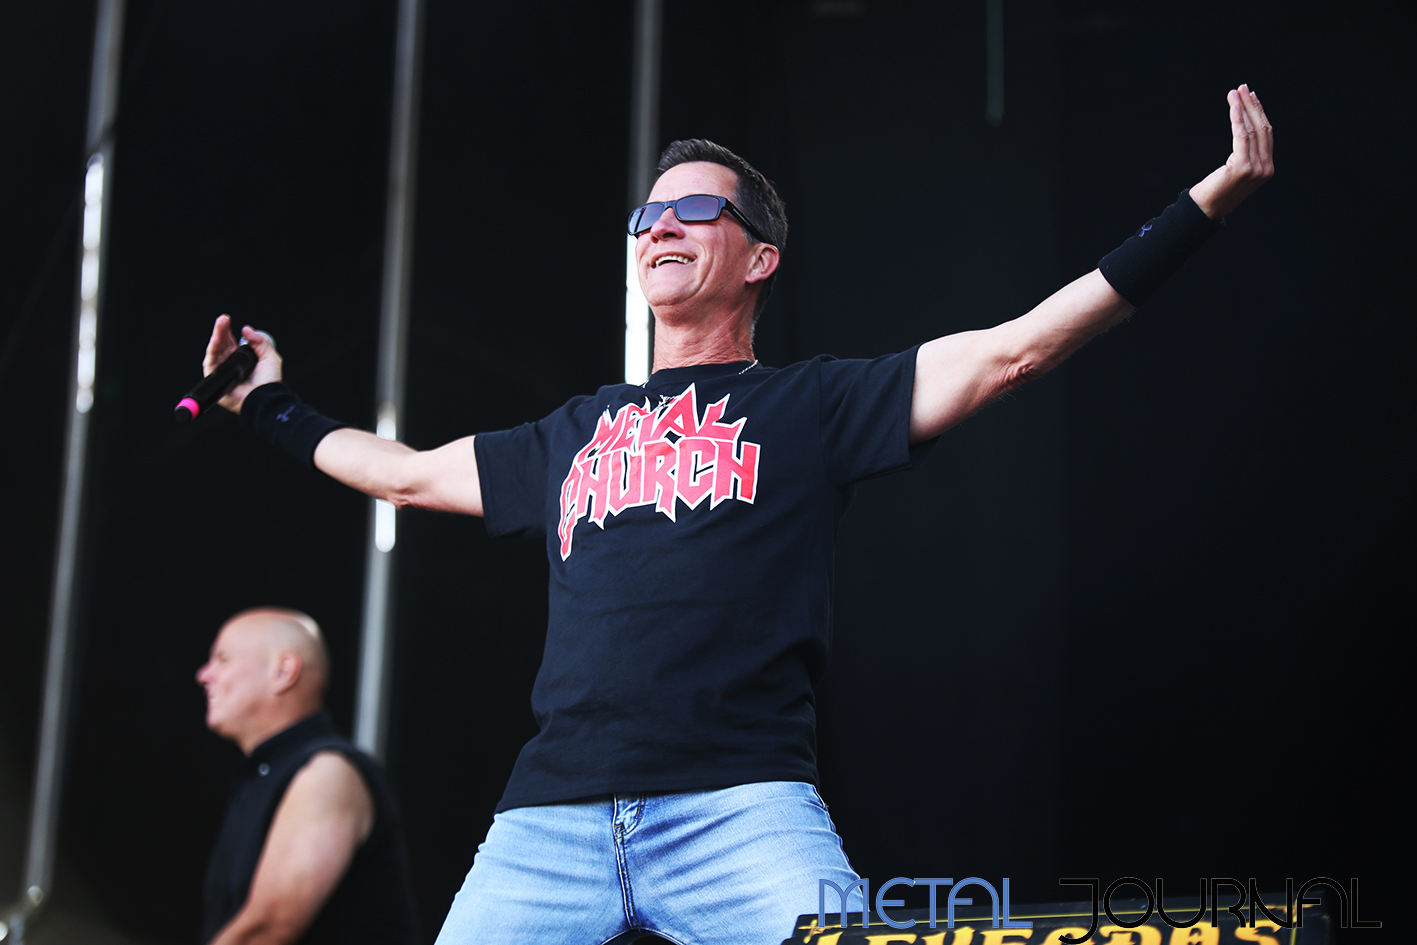 metal church - leyendas del rock 2019 metal journal pic 5